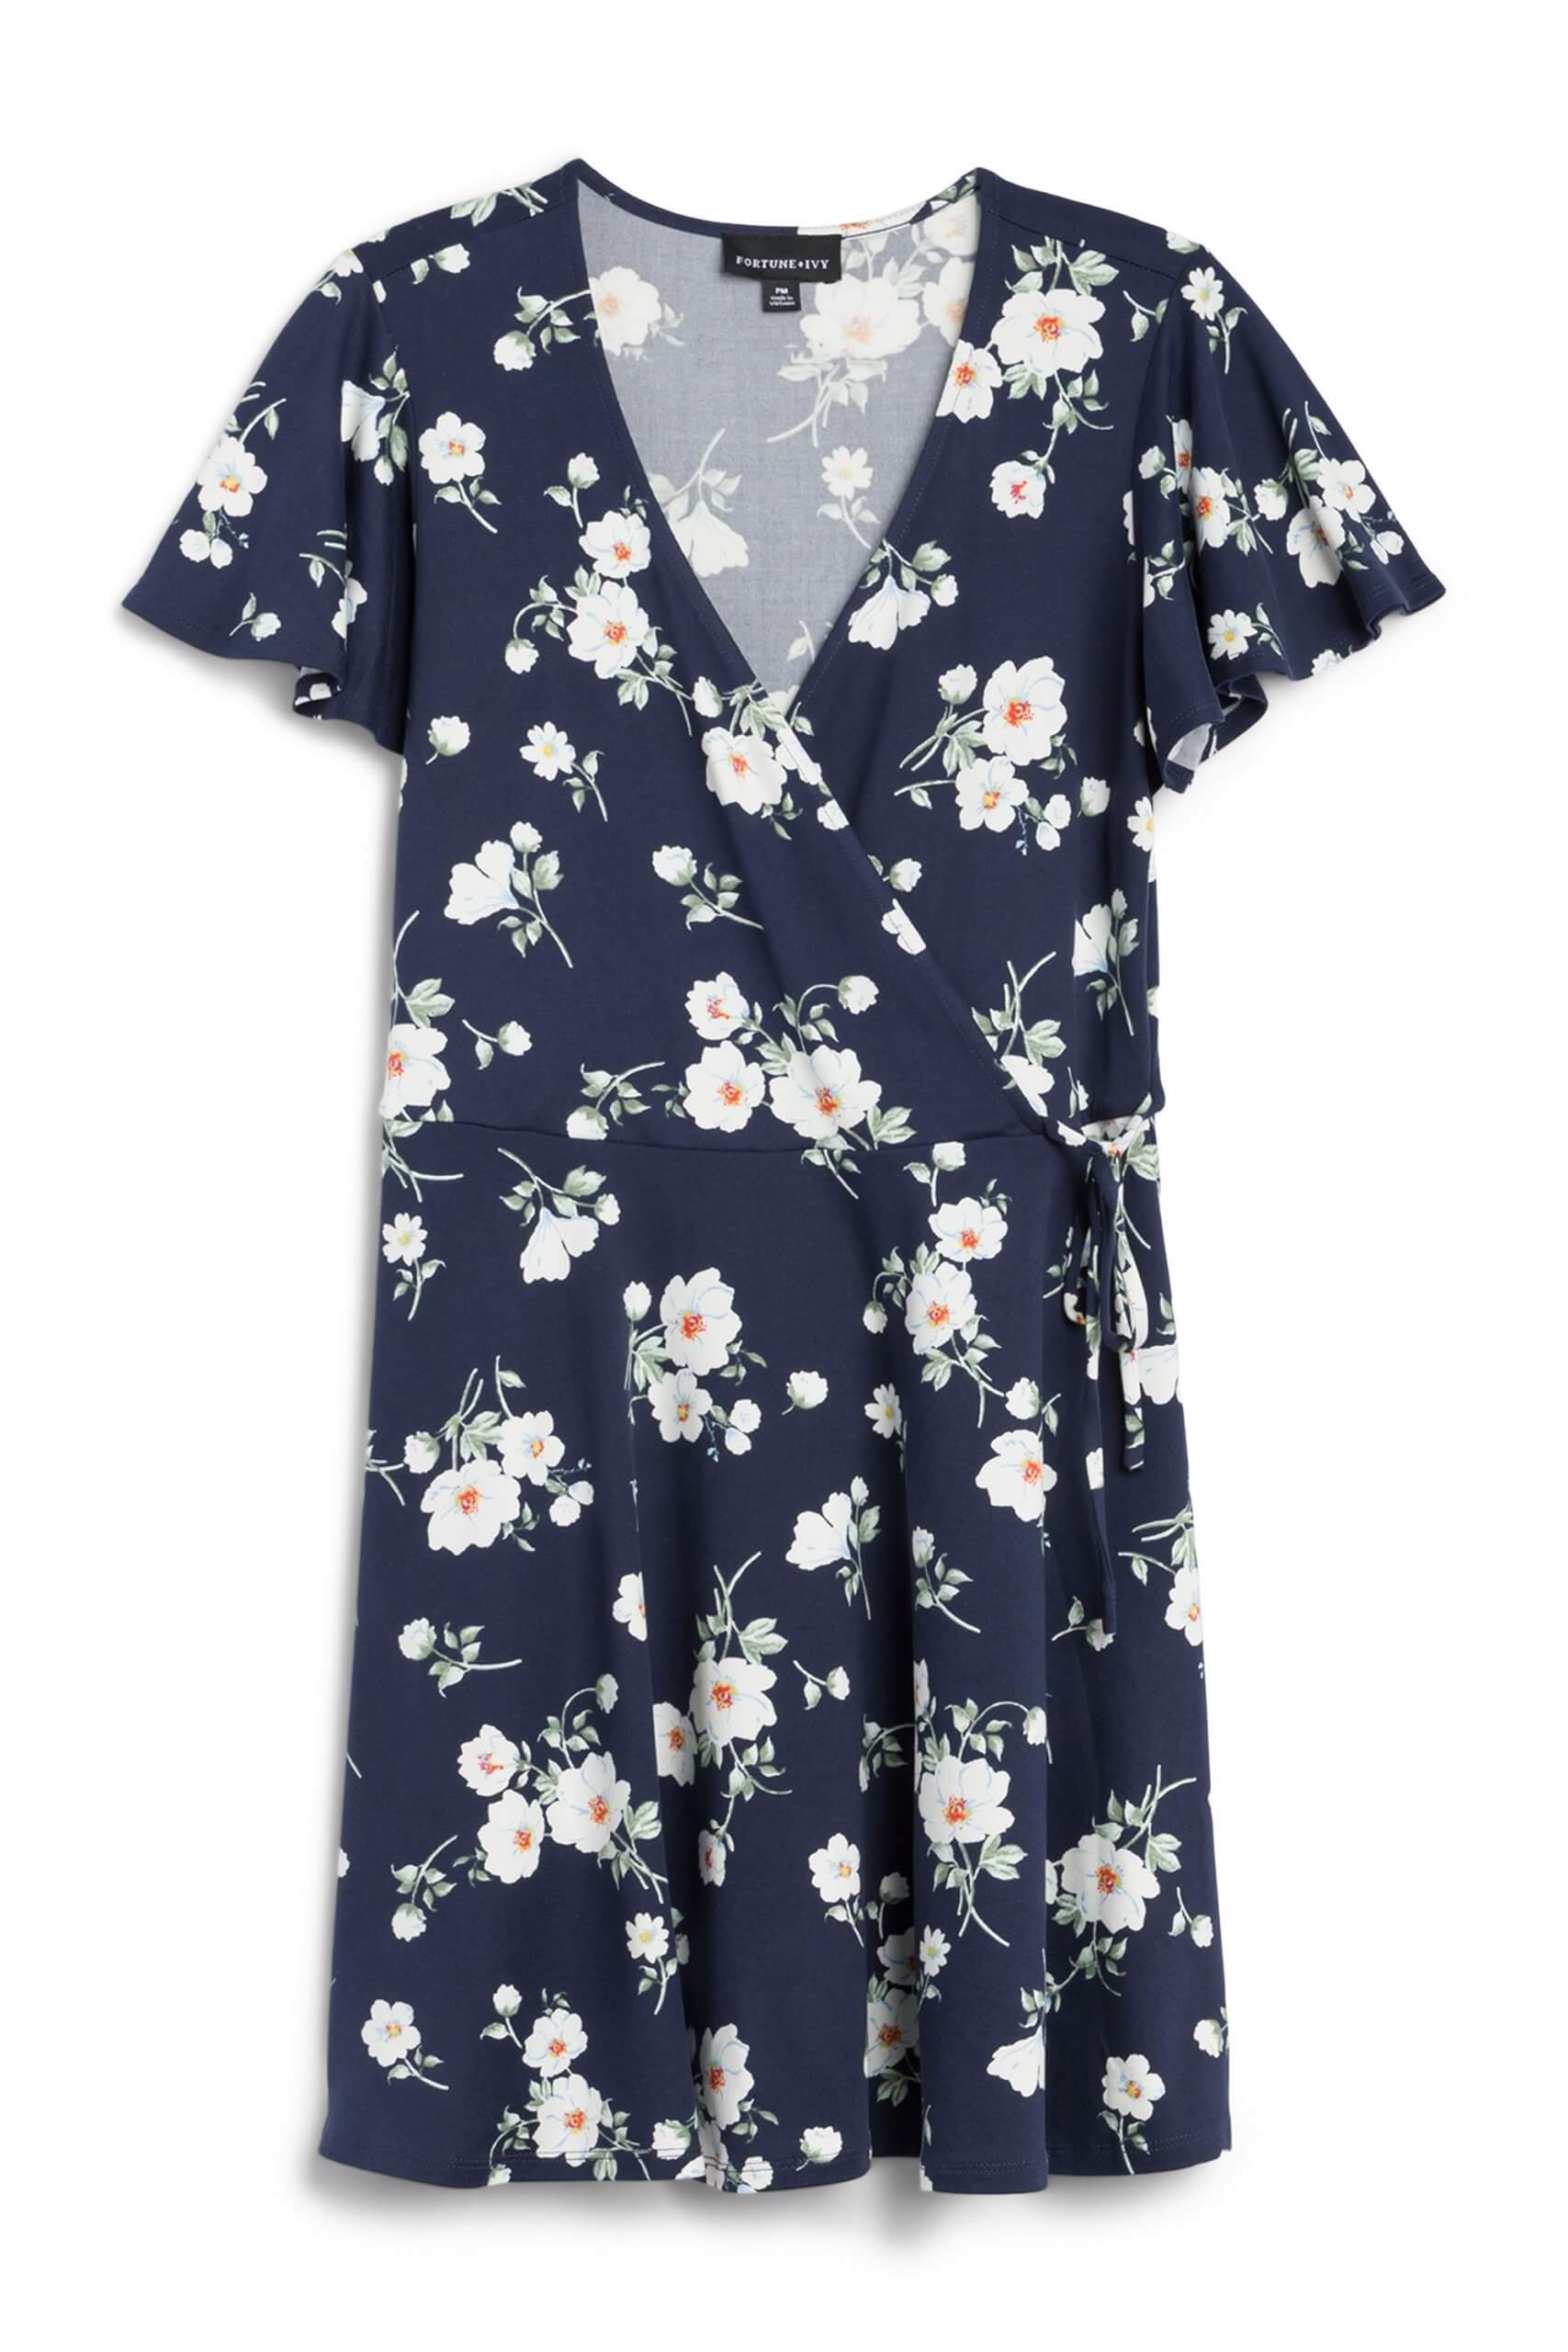 Stitch Fix Women's navy blue floral dress.